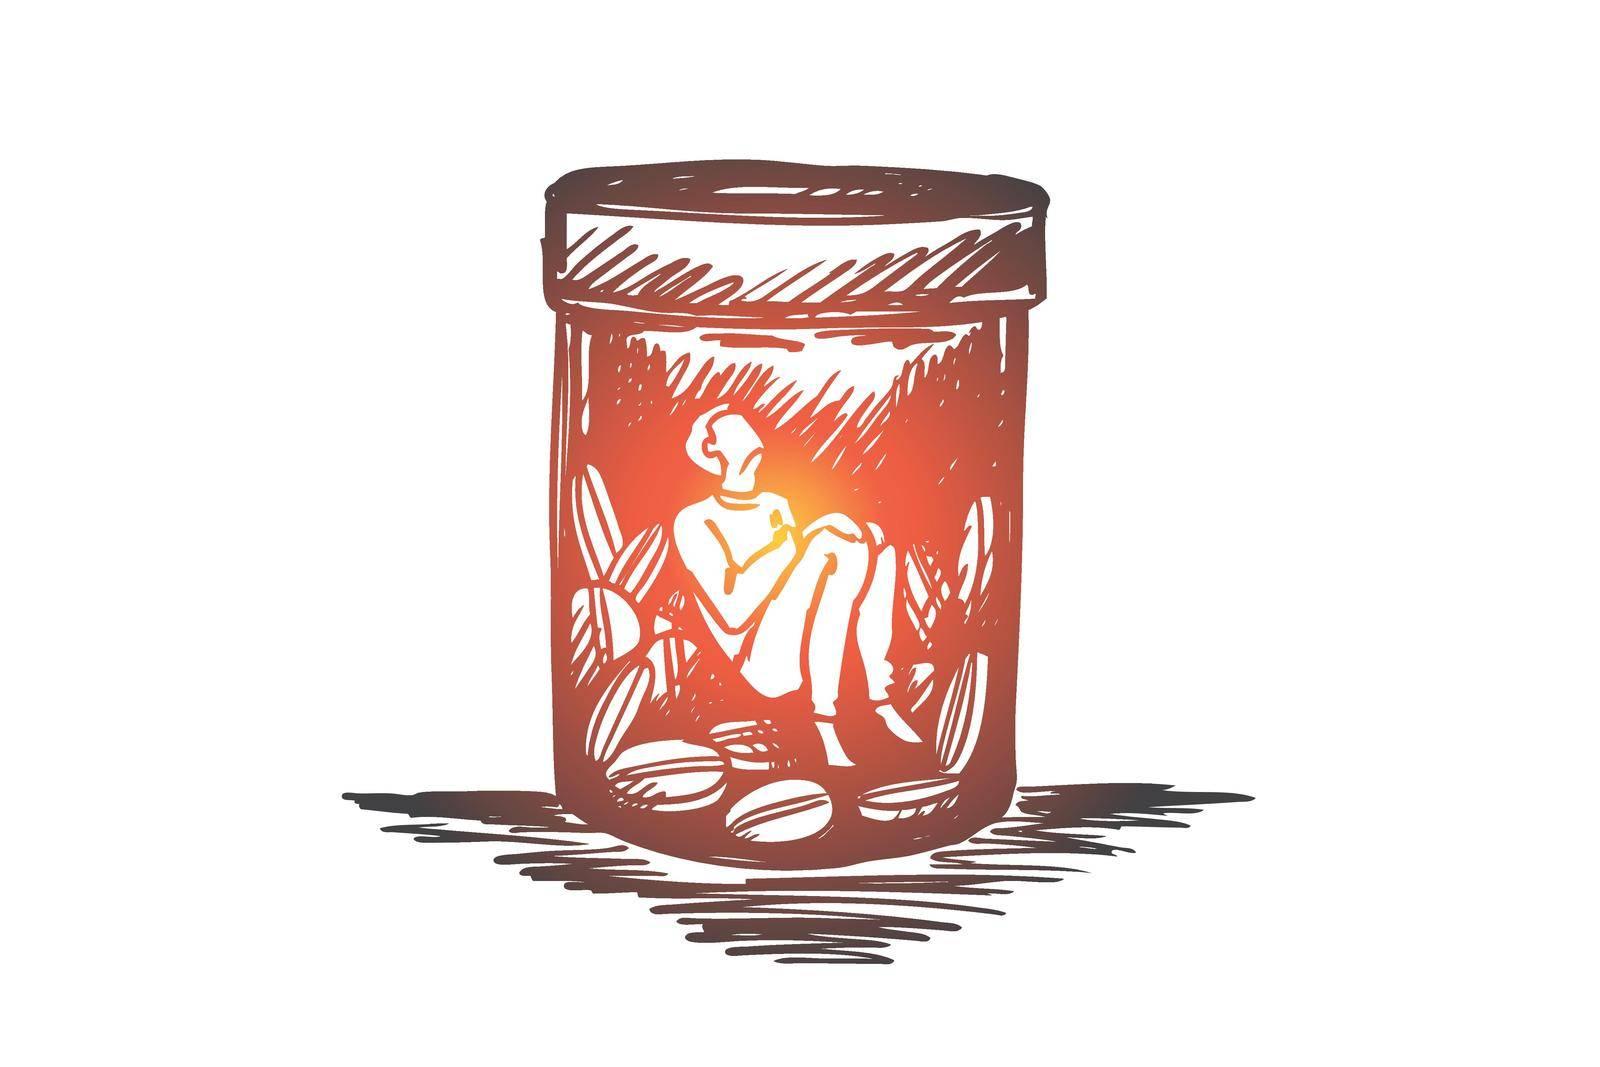 Painkiller, addiction, drugs, disease concept. Hand drawn isolated vector. by Vasilyeva